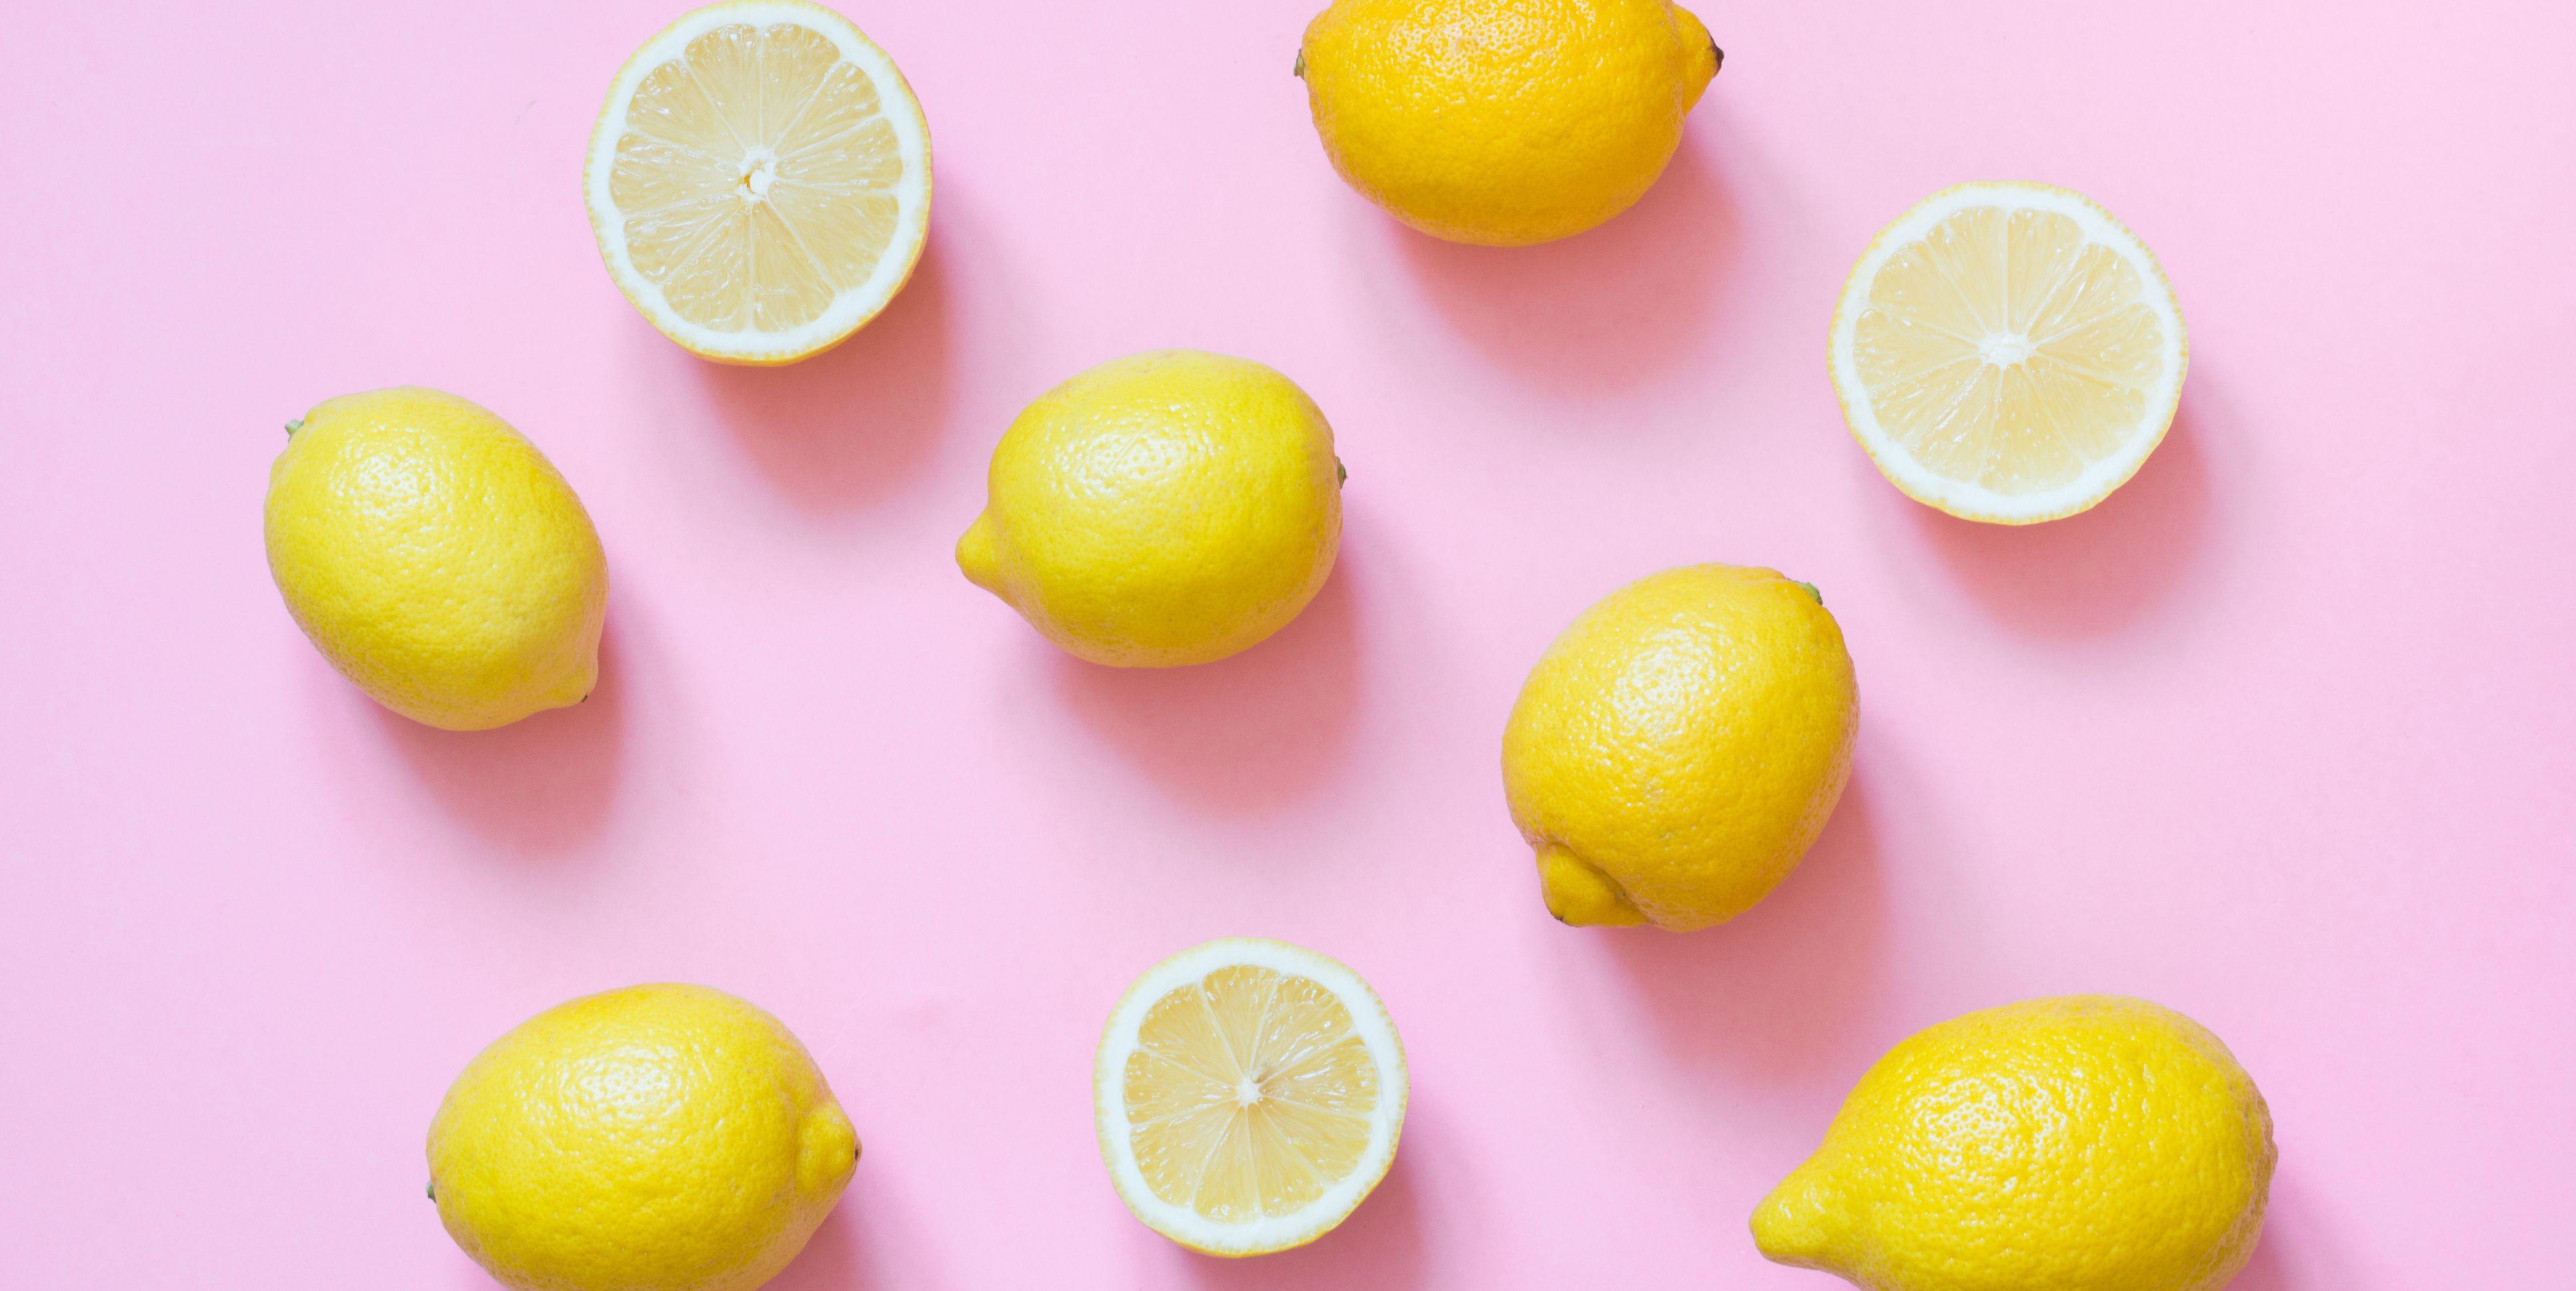 Fresh whole and sliced lemon on pink background. Flat lay.